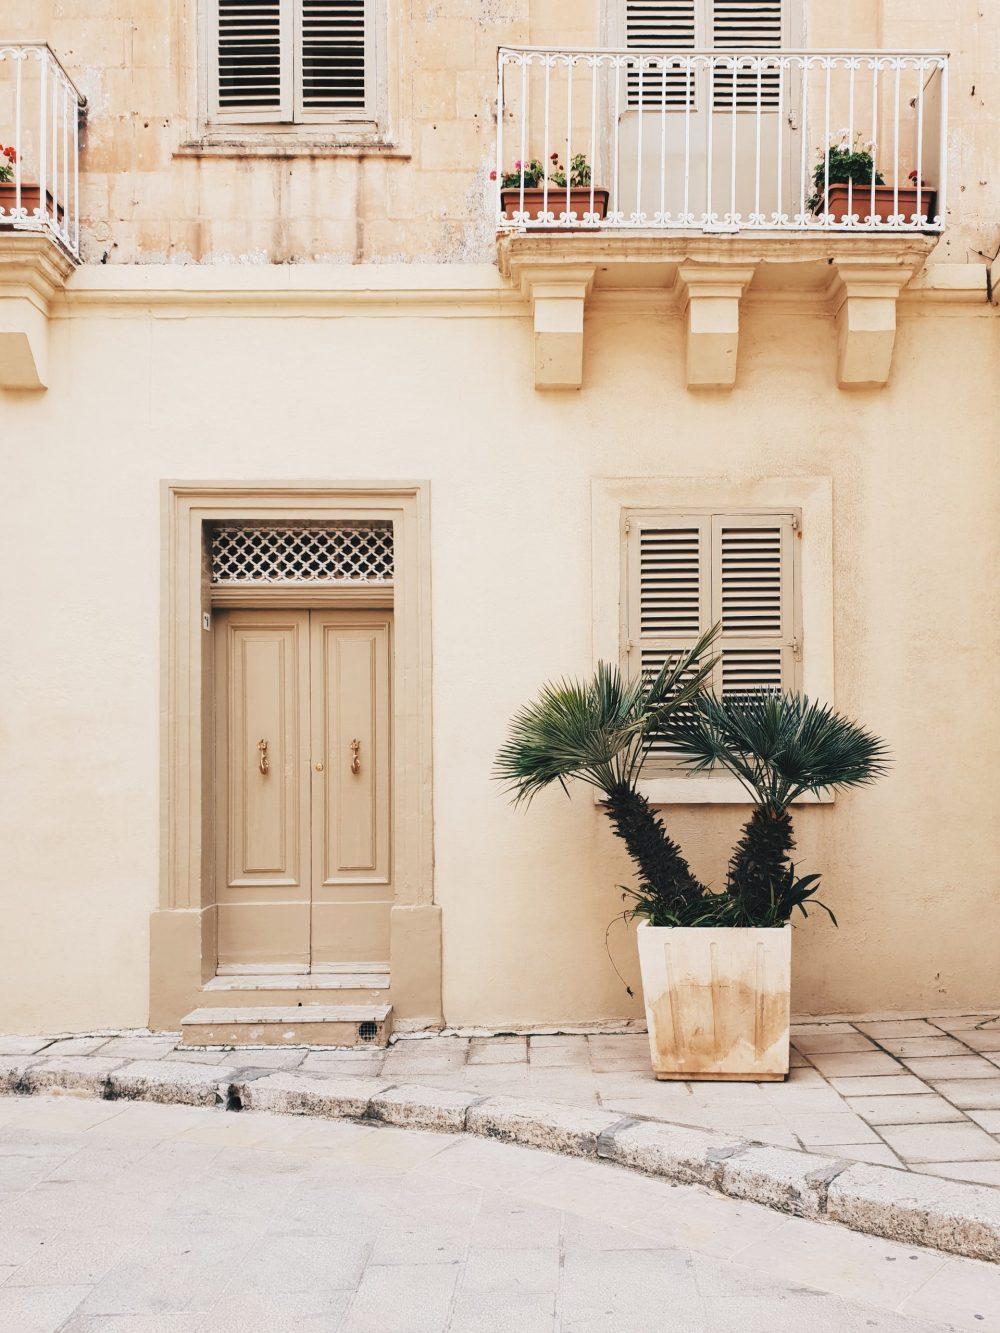 Mdina - The Silent City, Malta